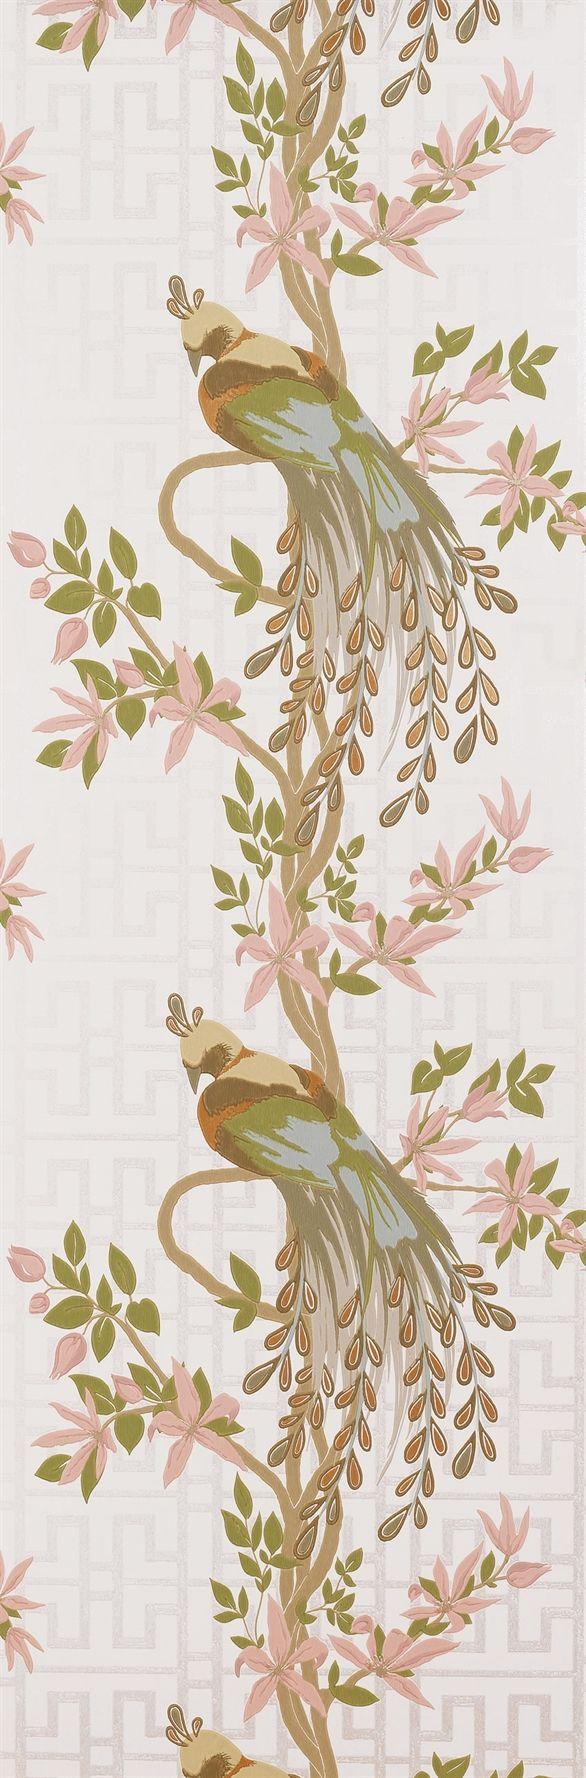 17 best images about bird wallpaper on pinterest rose - Nina campbell paradiso wallpaper ...